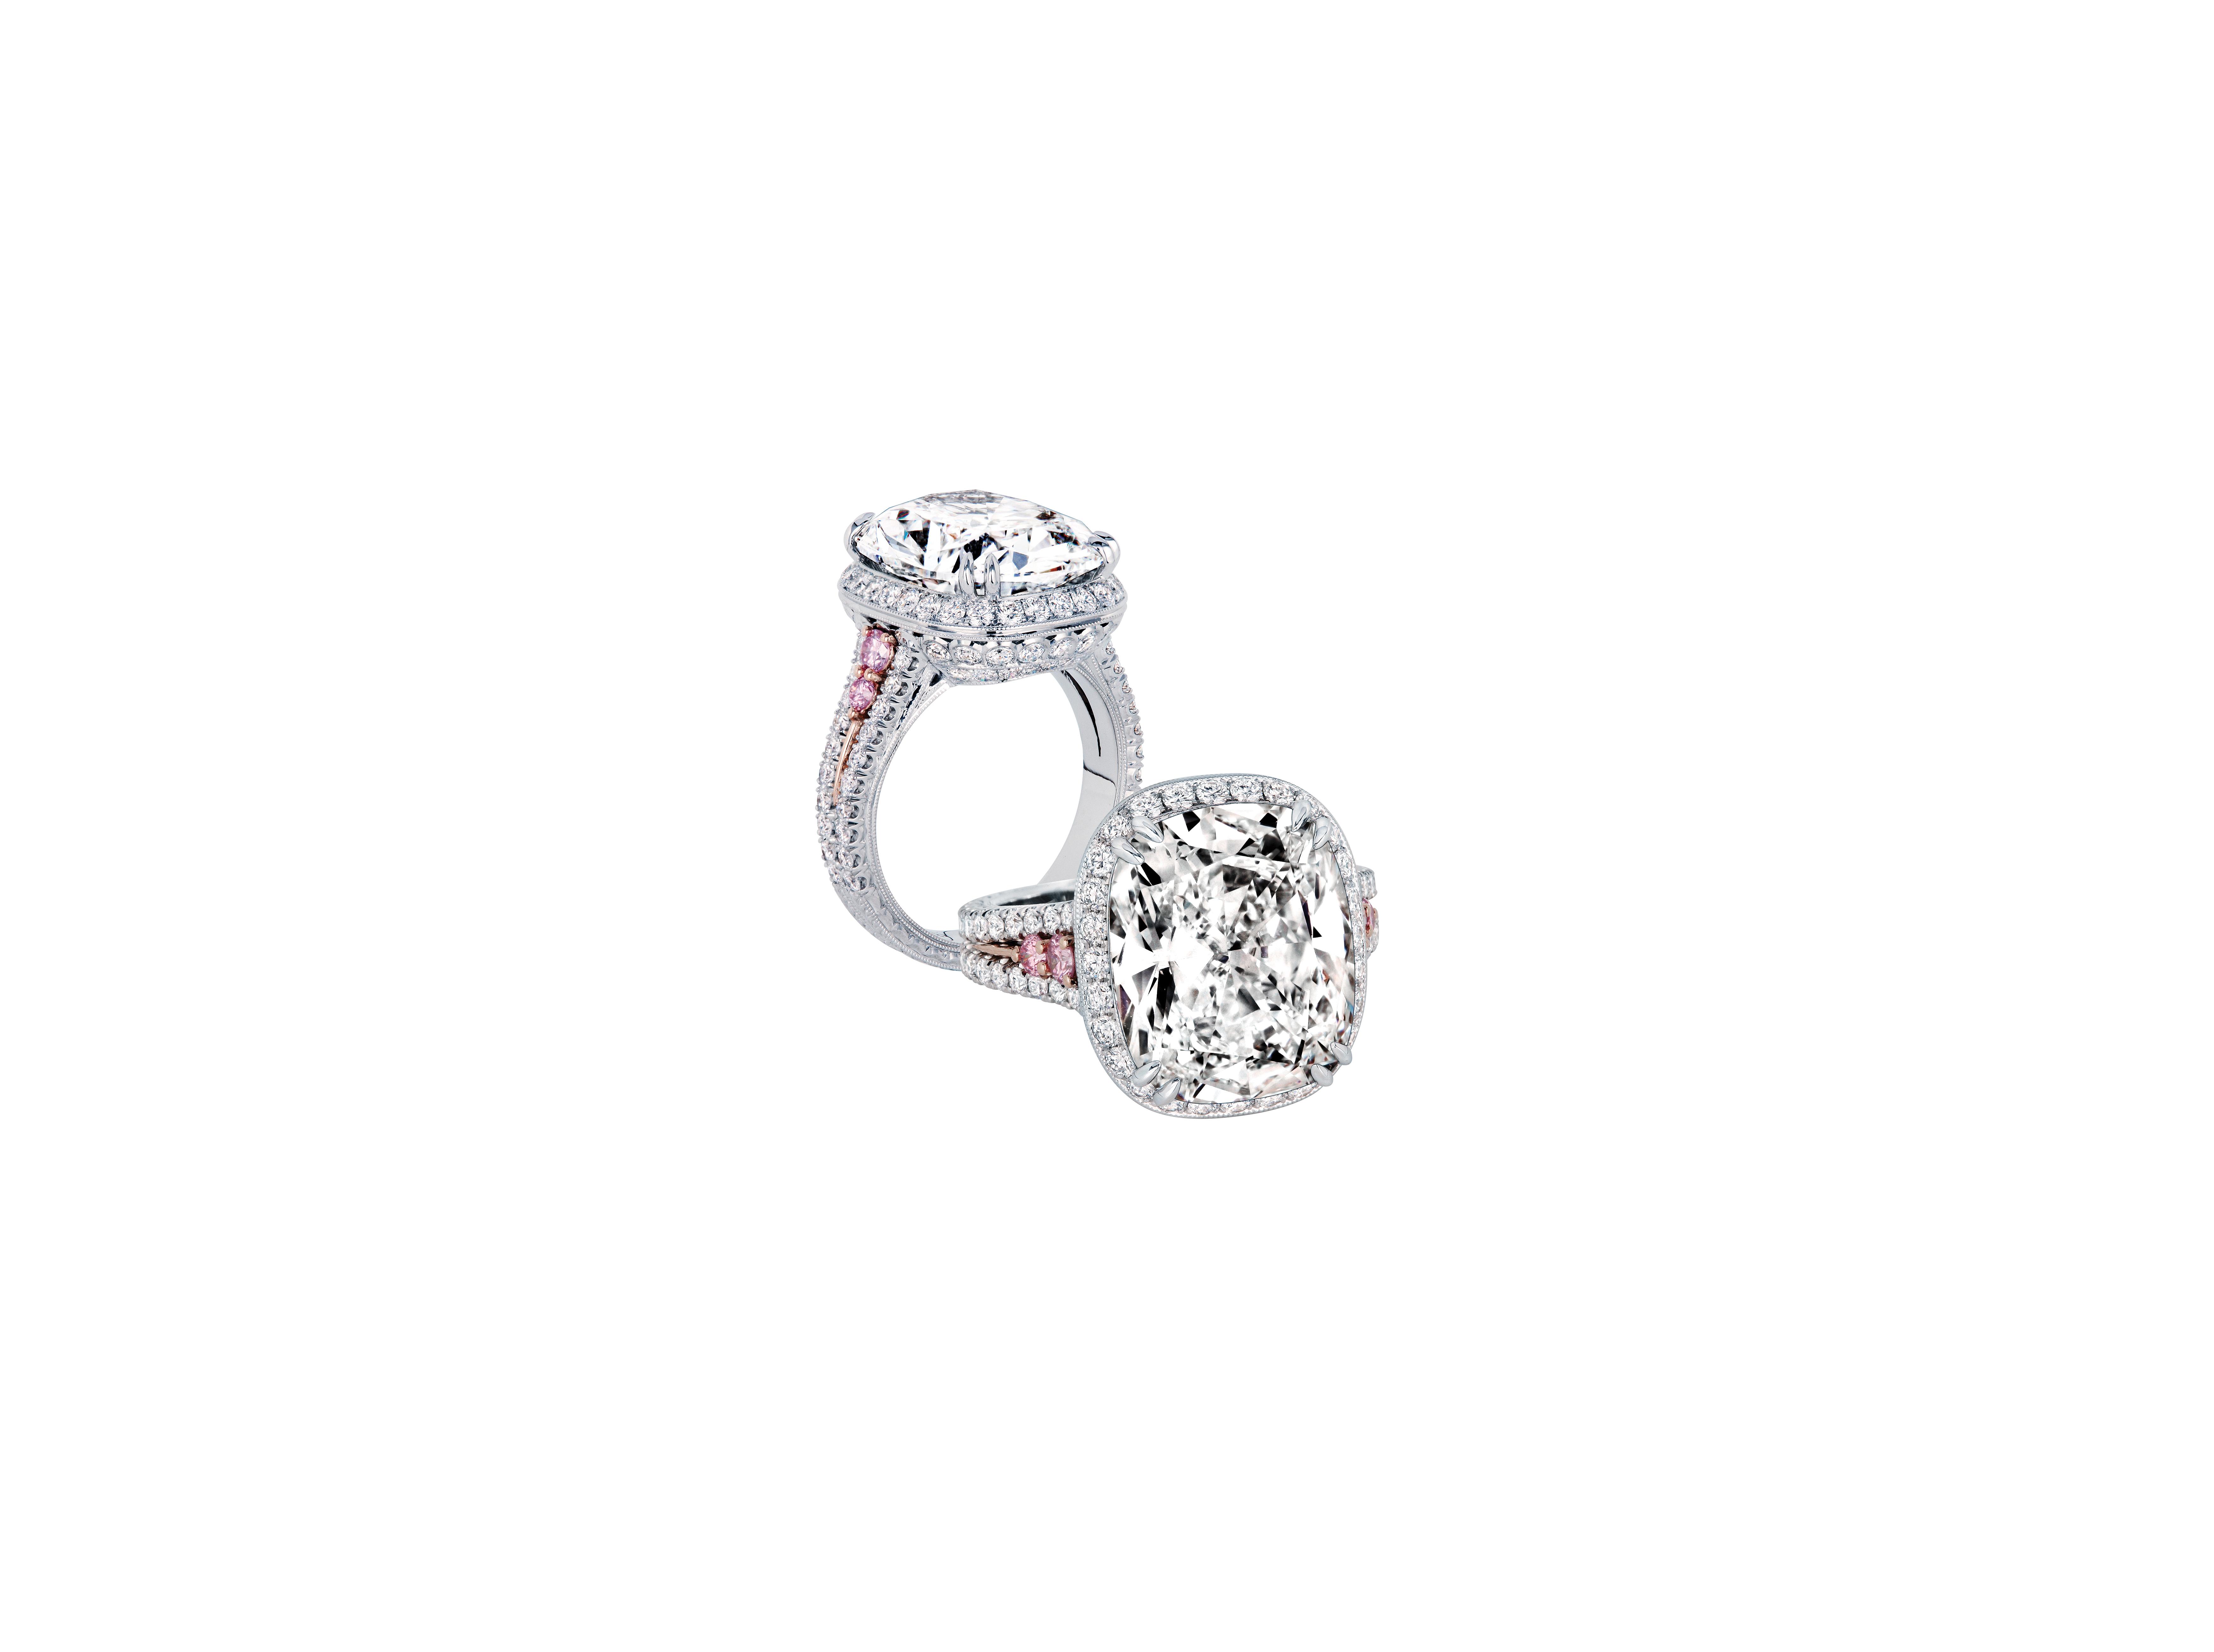 Cushion Cut Diamond Engagement Rings Martha Stewart Weddings